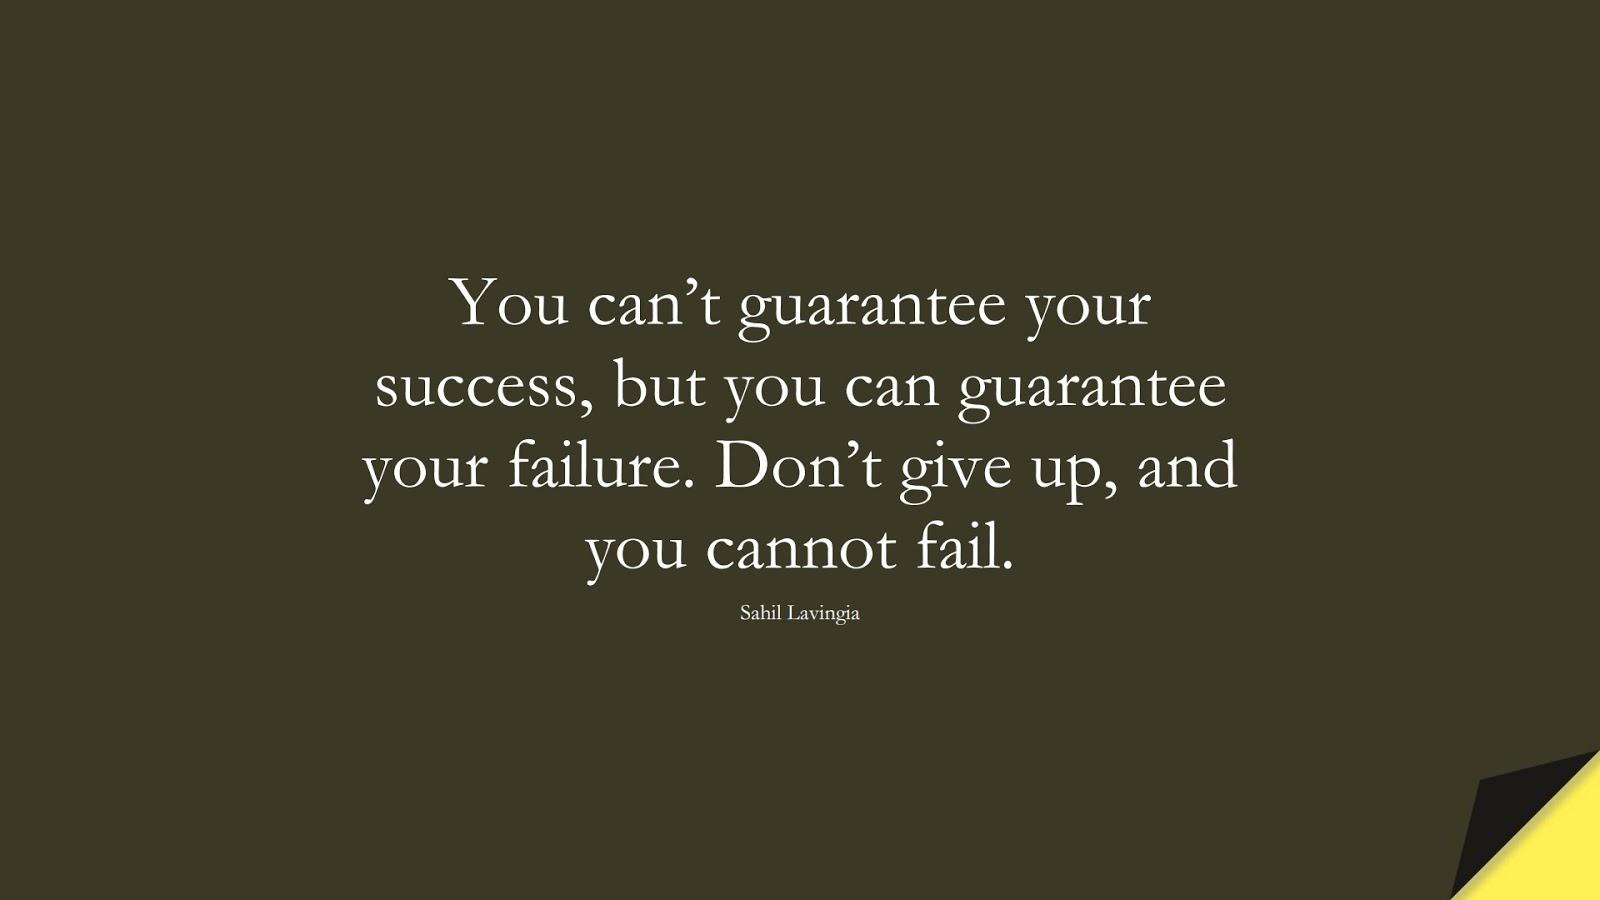 You can't guarantee your success, but you can guarantee your failure. Don't give up, and you cannot fail. (Sahil Lavingia);  #NeverGiveUpQuotes